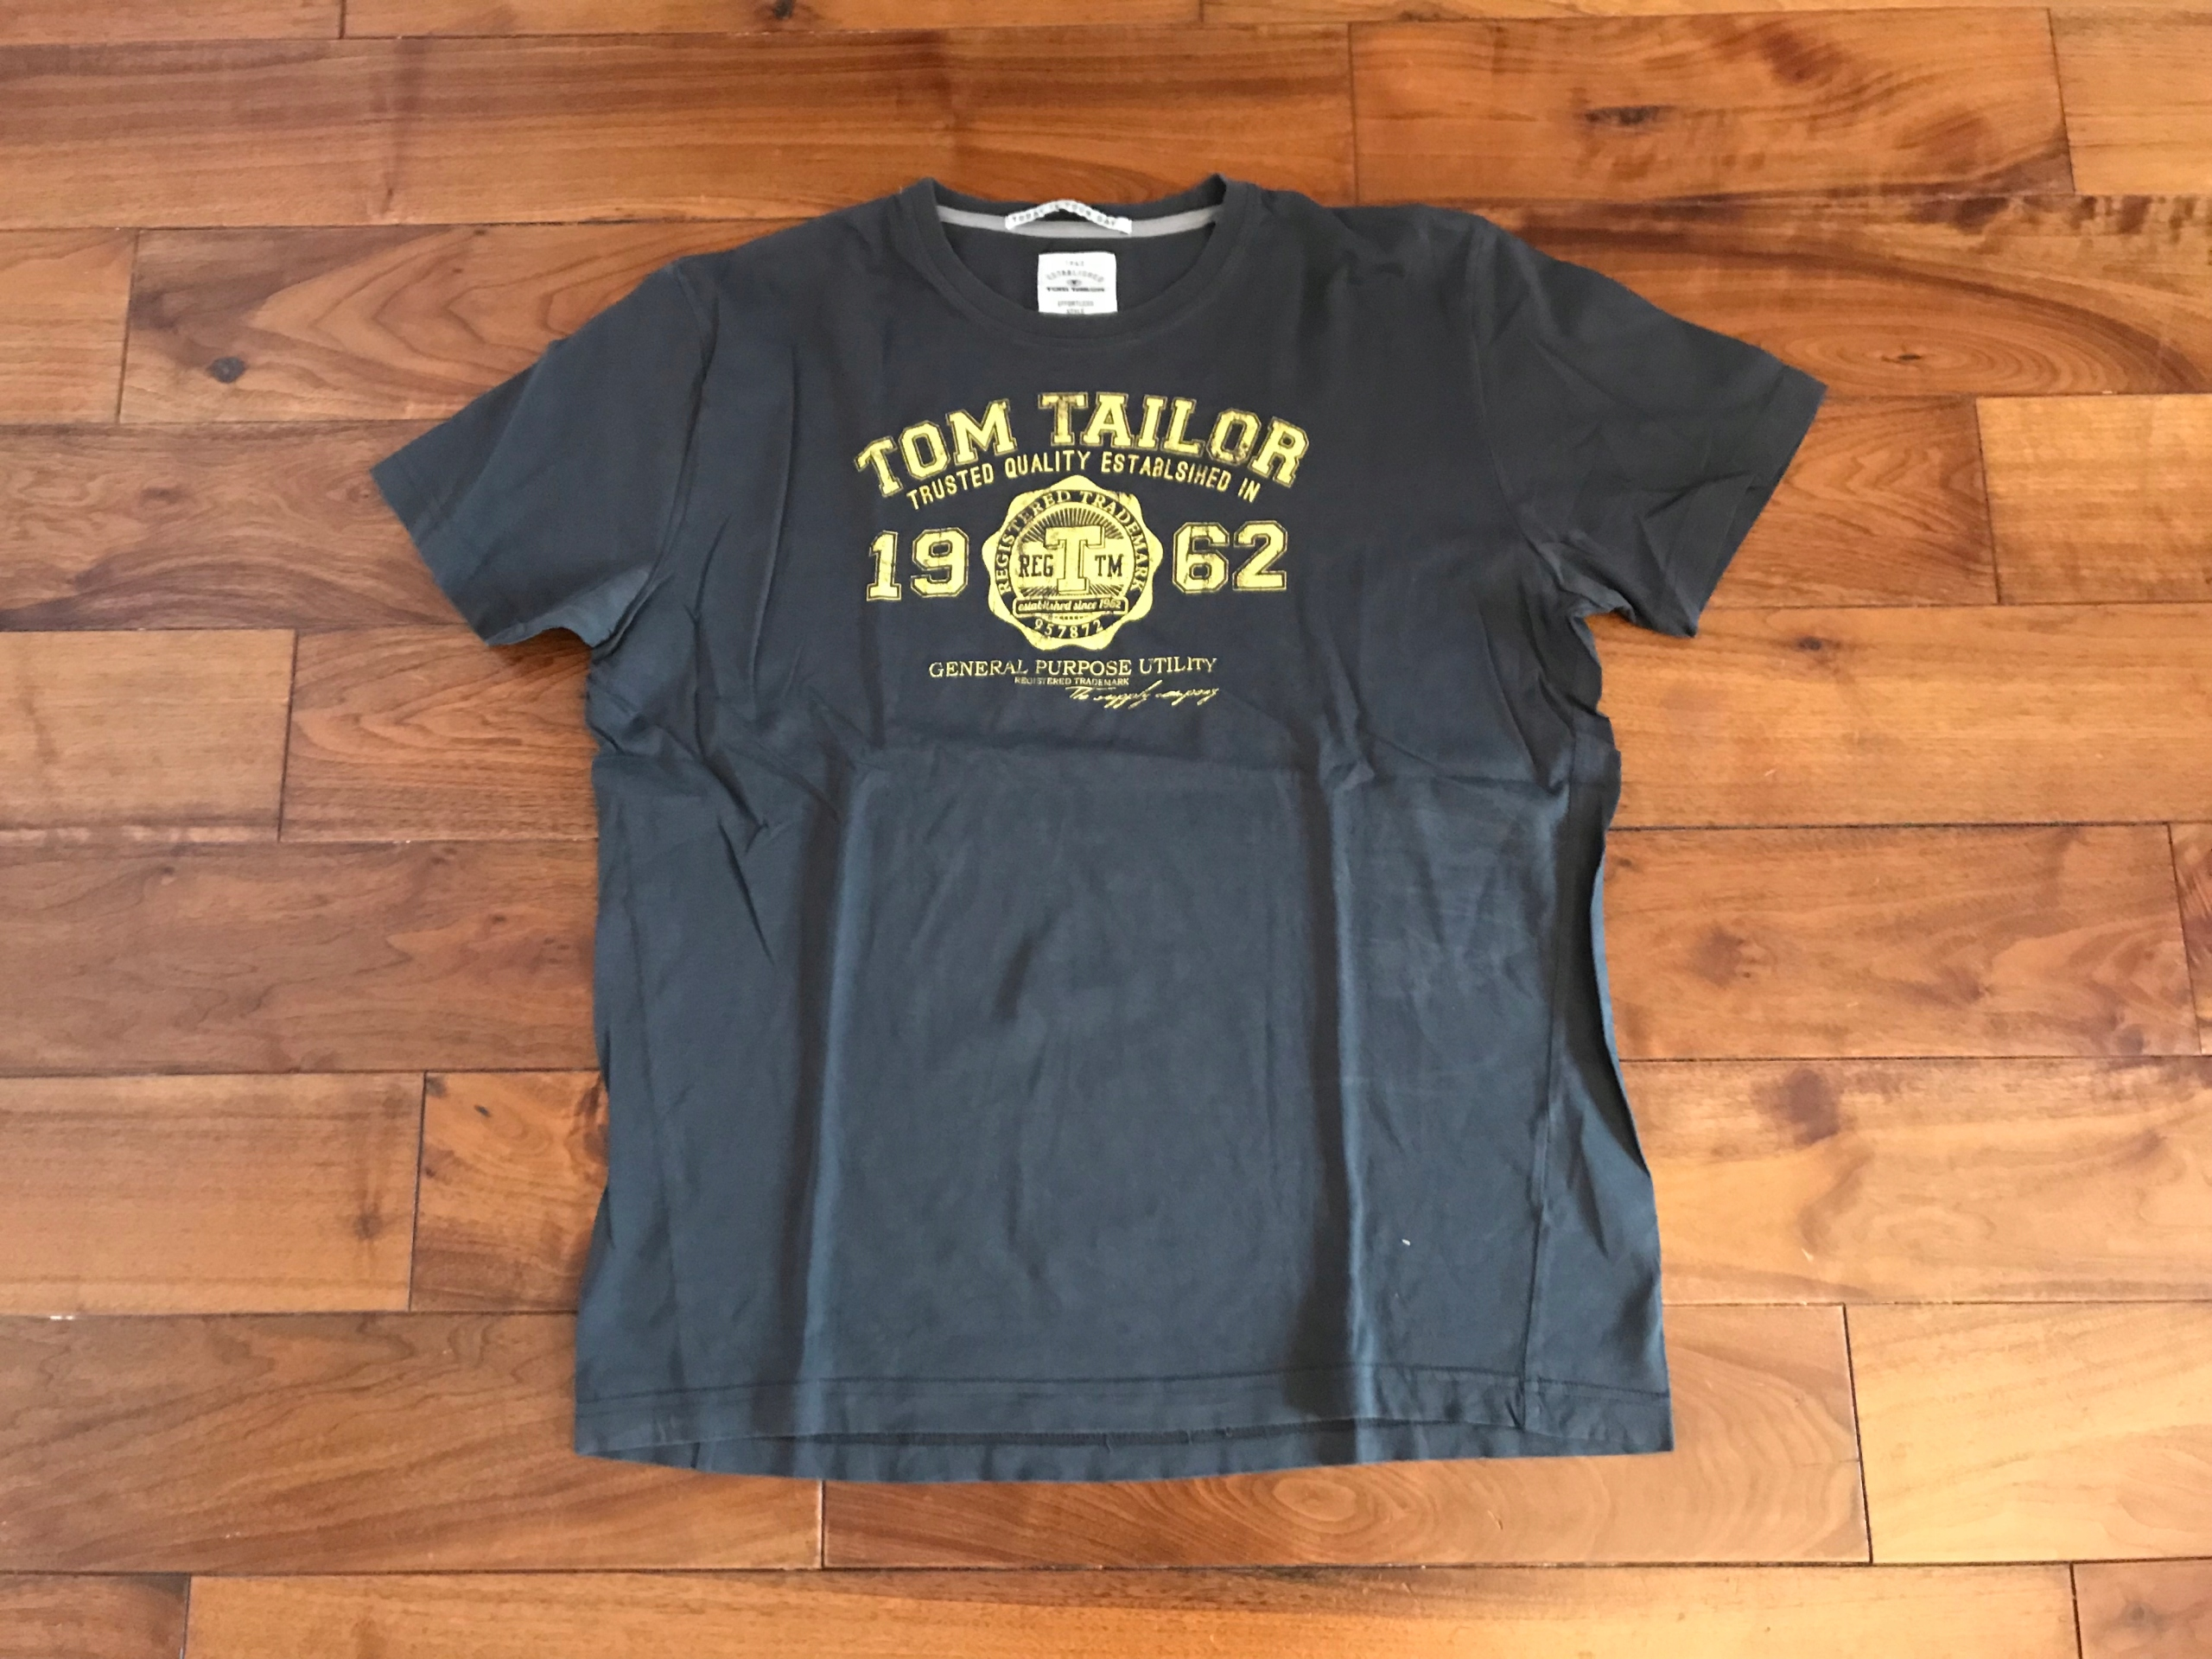 TOM TAILOR koszulka T-shirt grafitowa XL bawełna